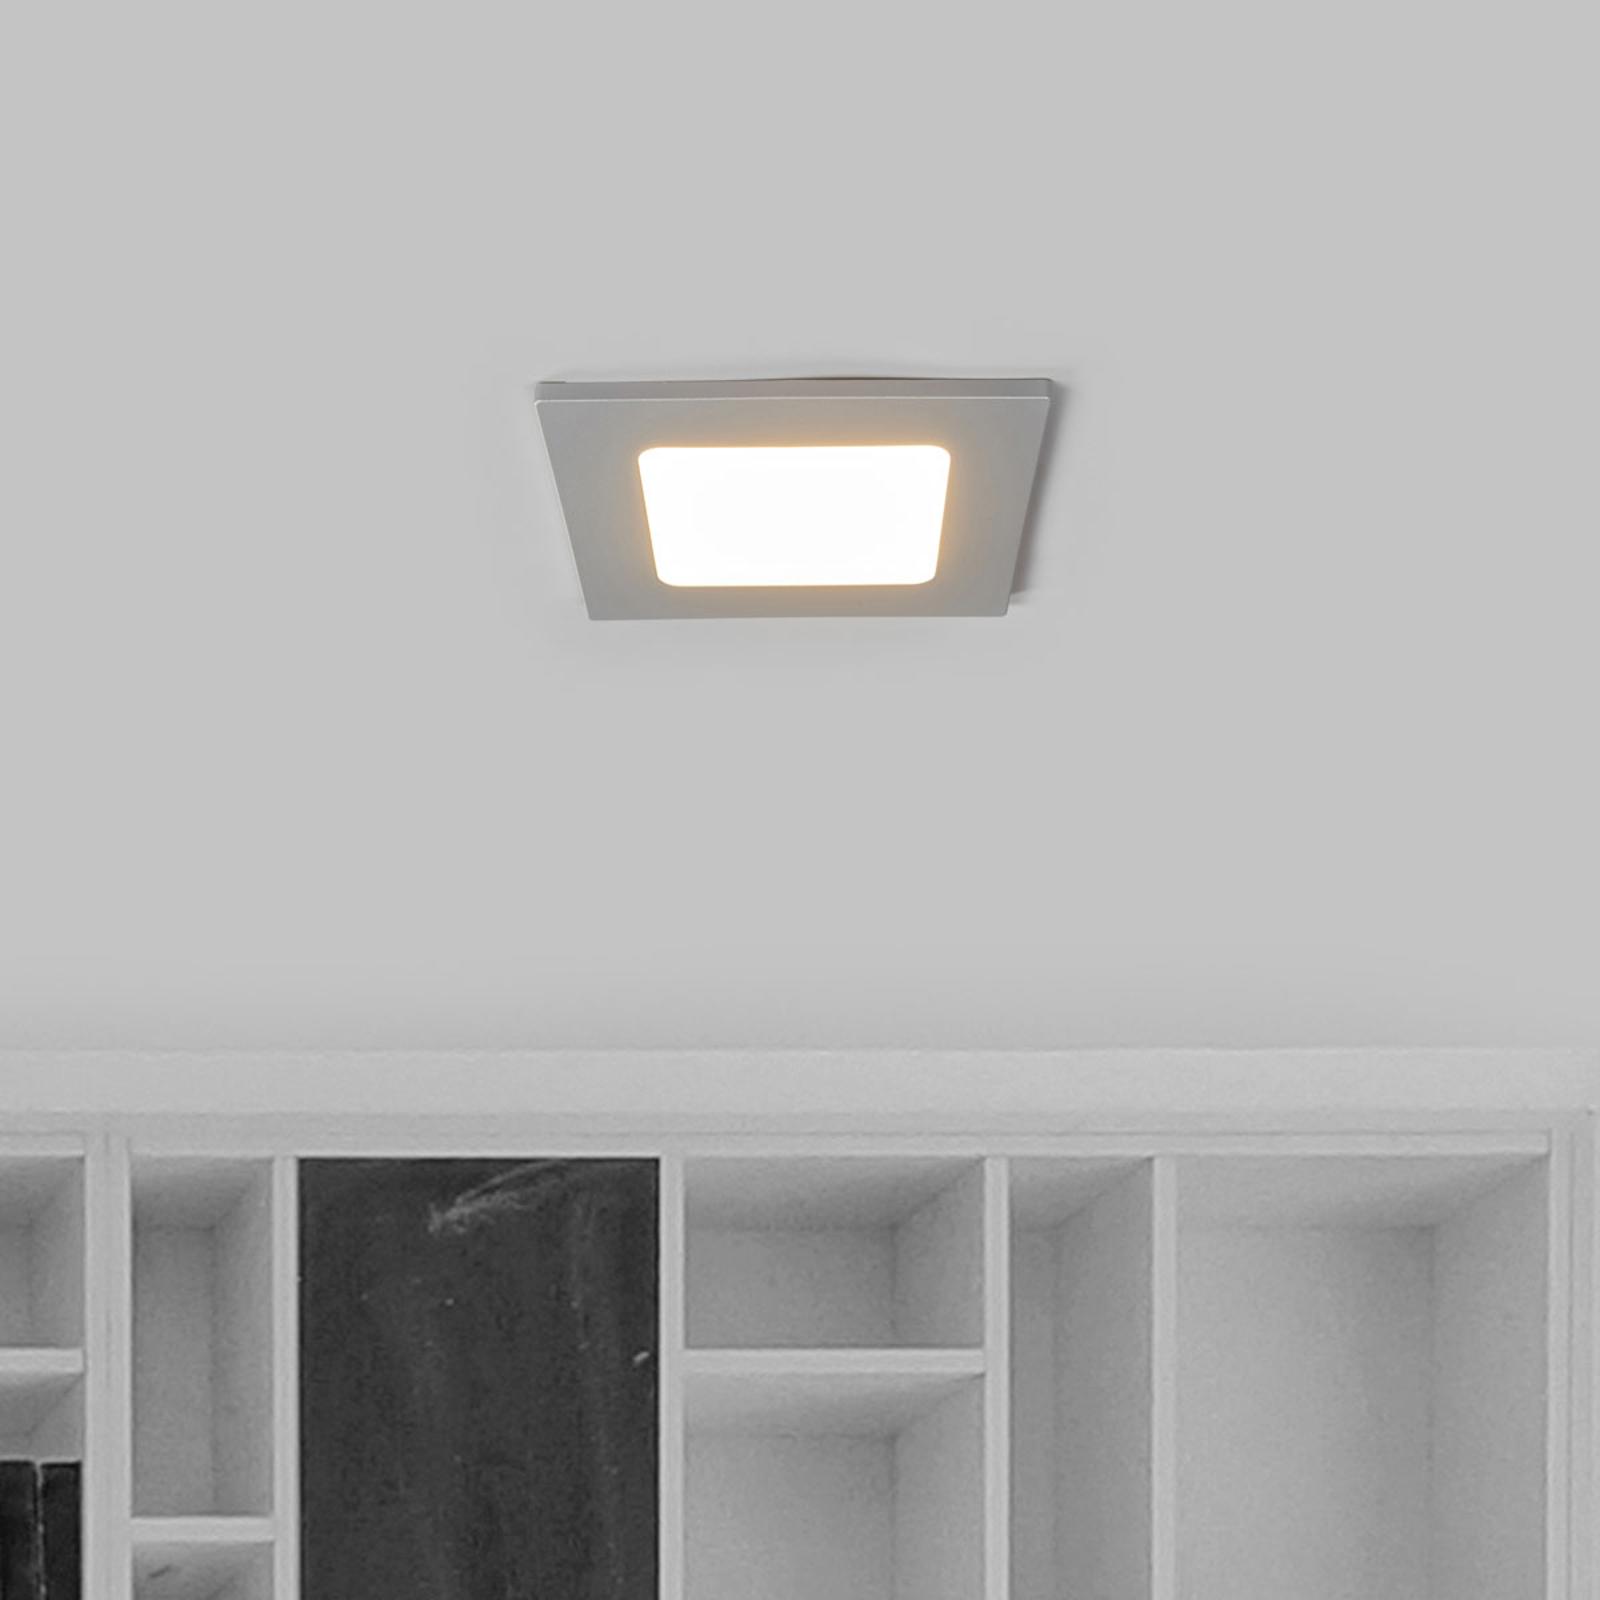 LED-kohdevalo Joki hopea 3000K kulmikas 11,5 cm